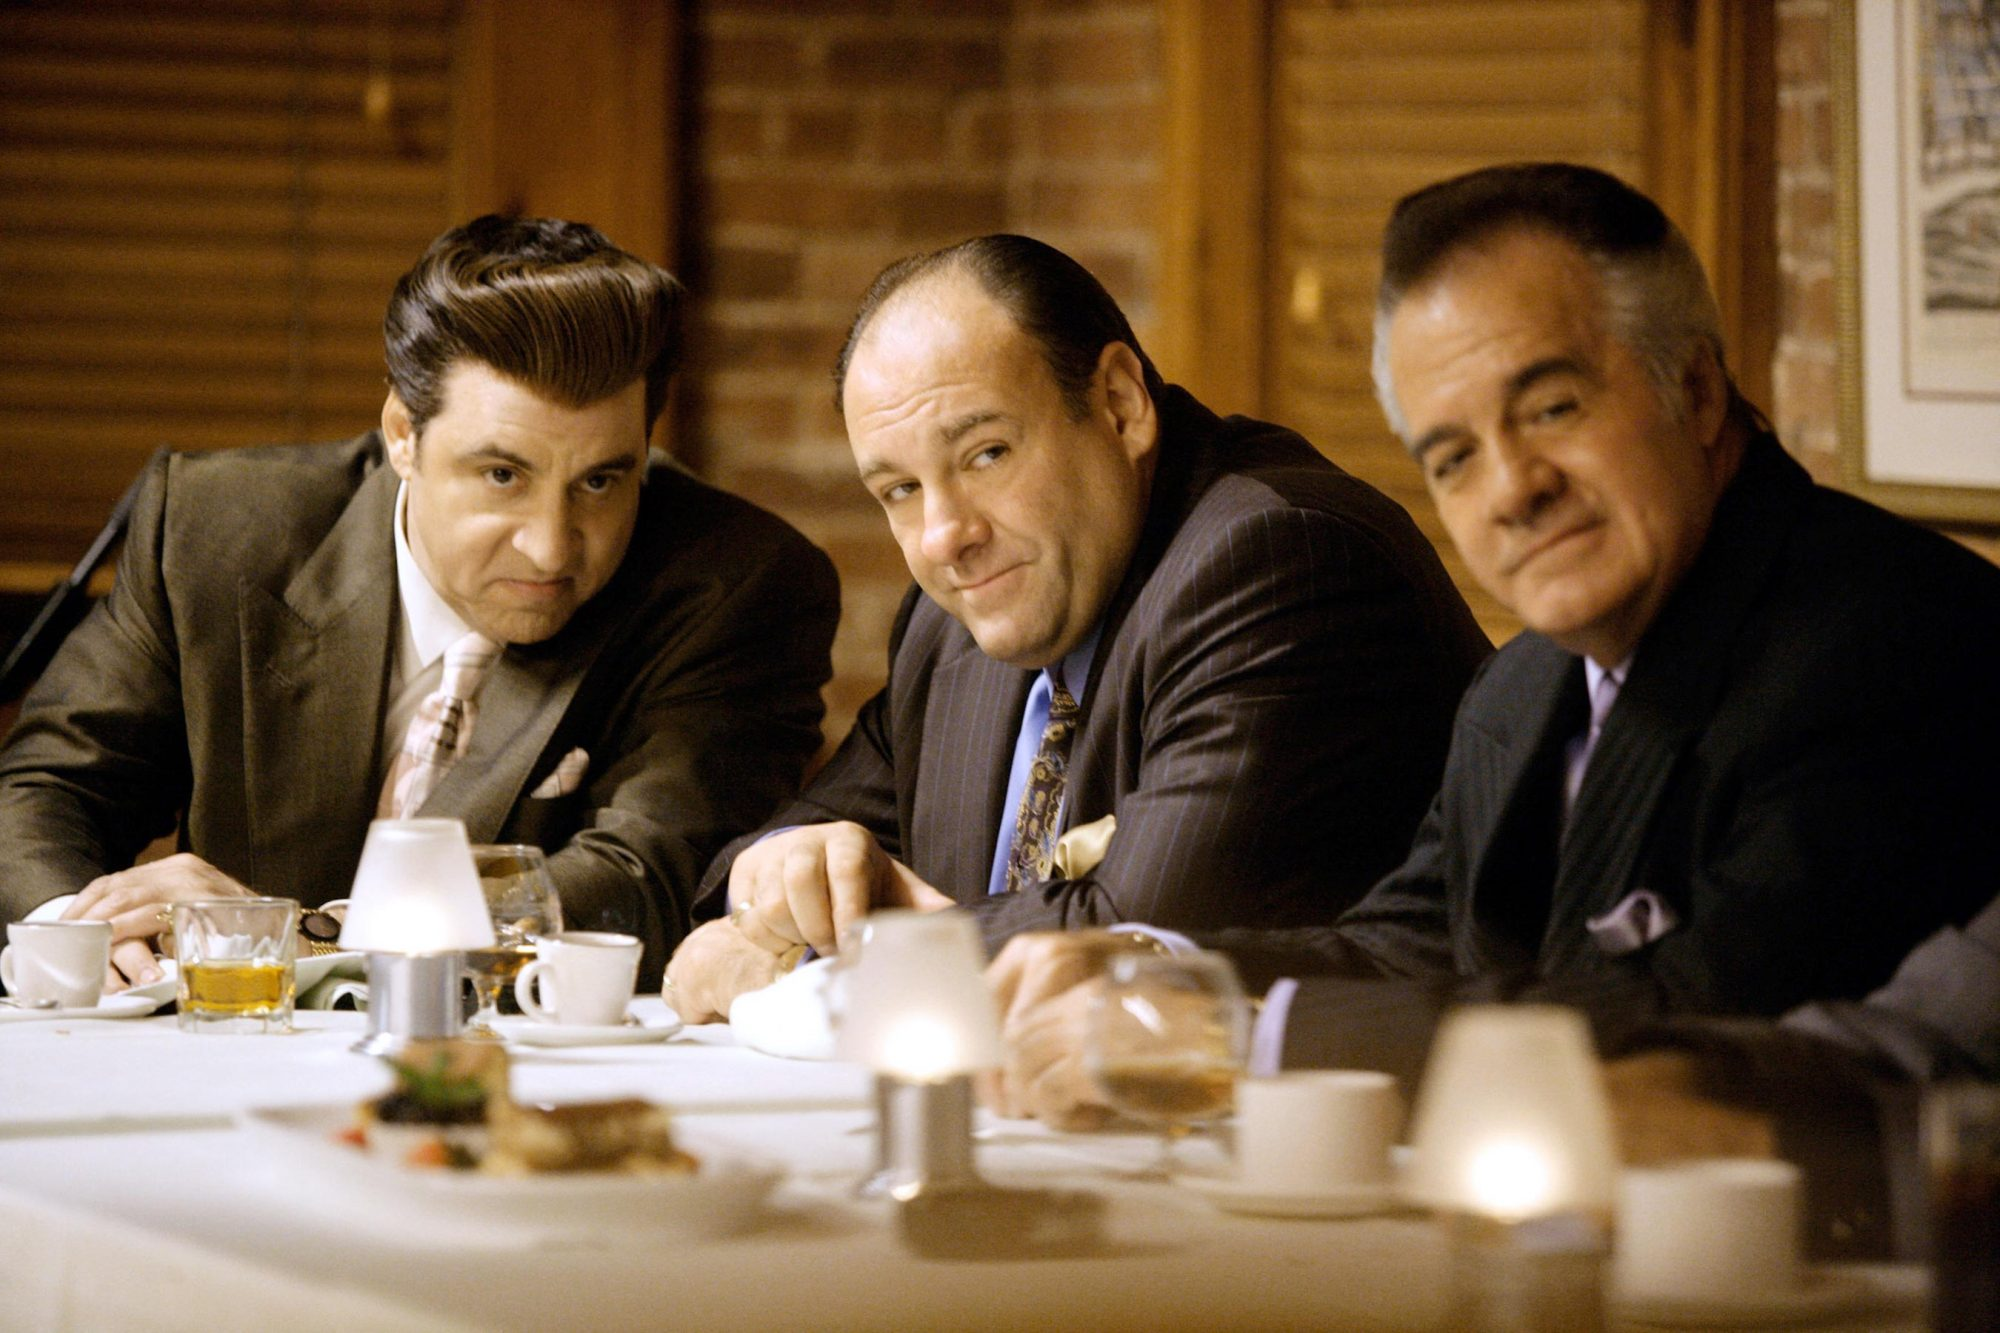 THE SOPRANOS, Steven Van Zandt, James Gandolfini, Tony Sirico, (Season 7), 1999-2007. photo: Craig B